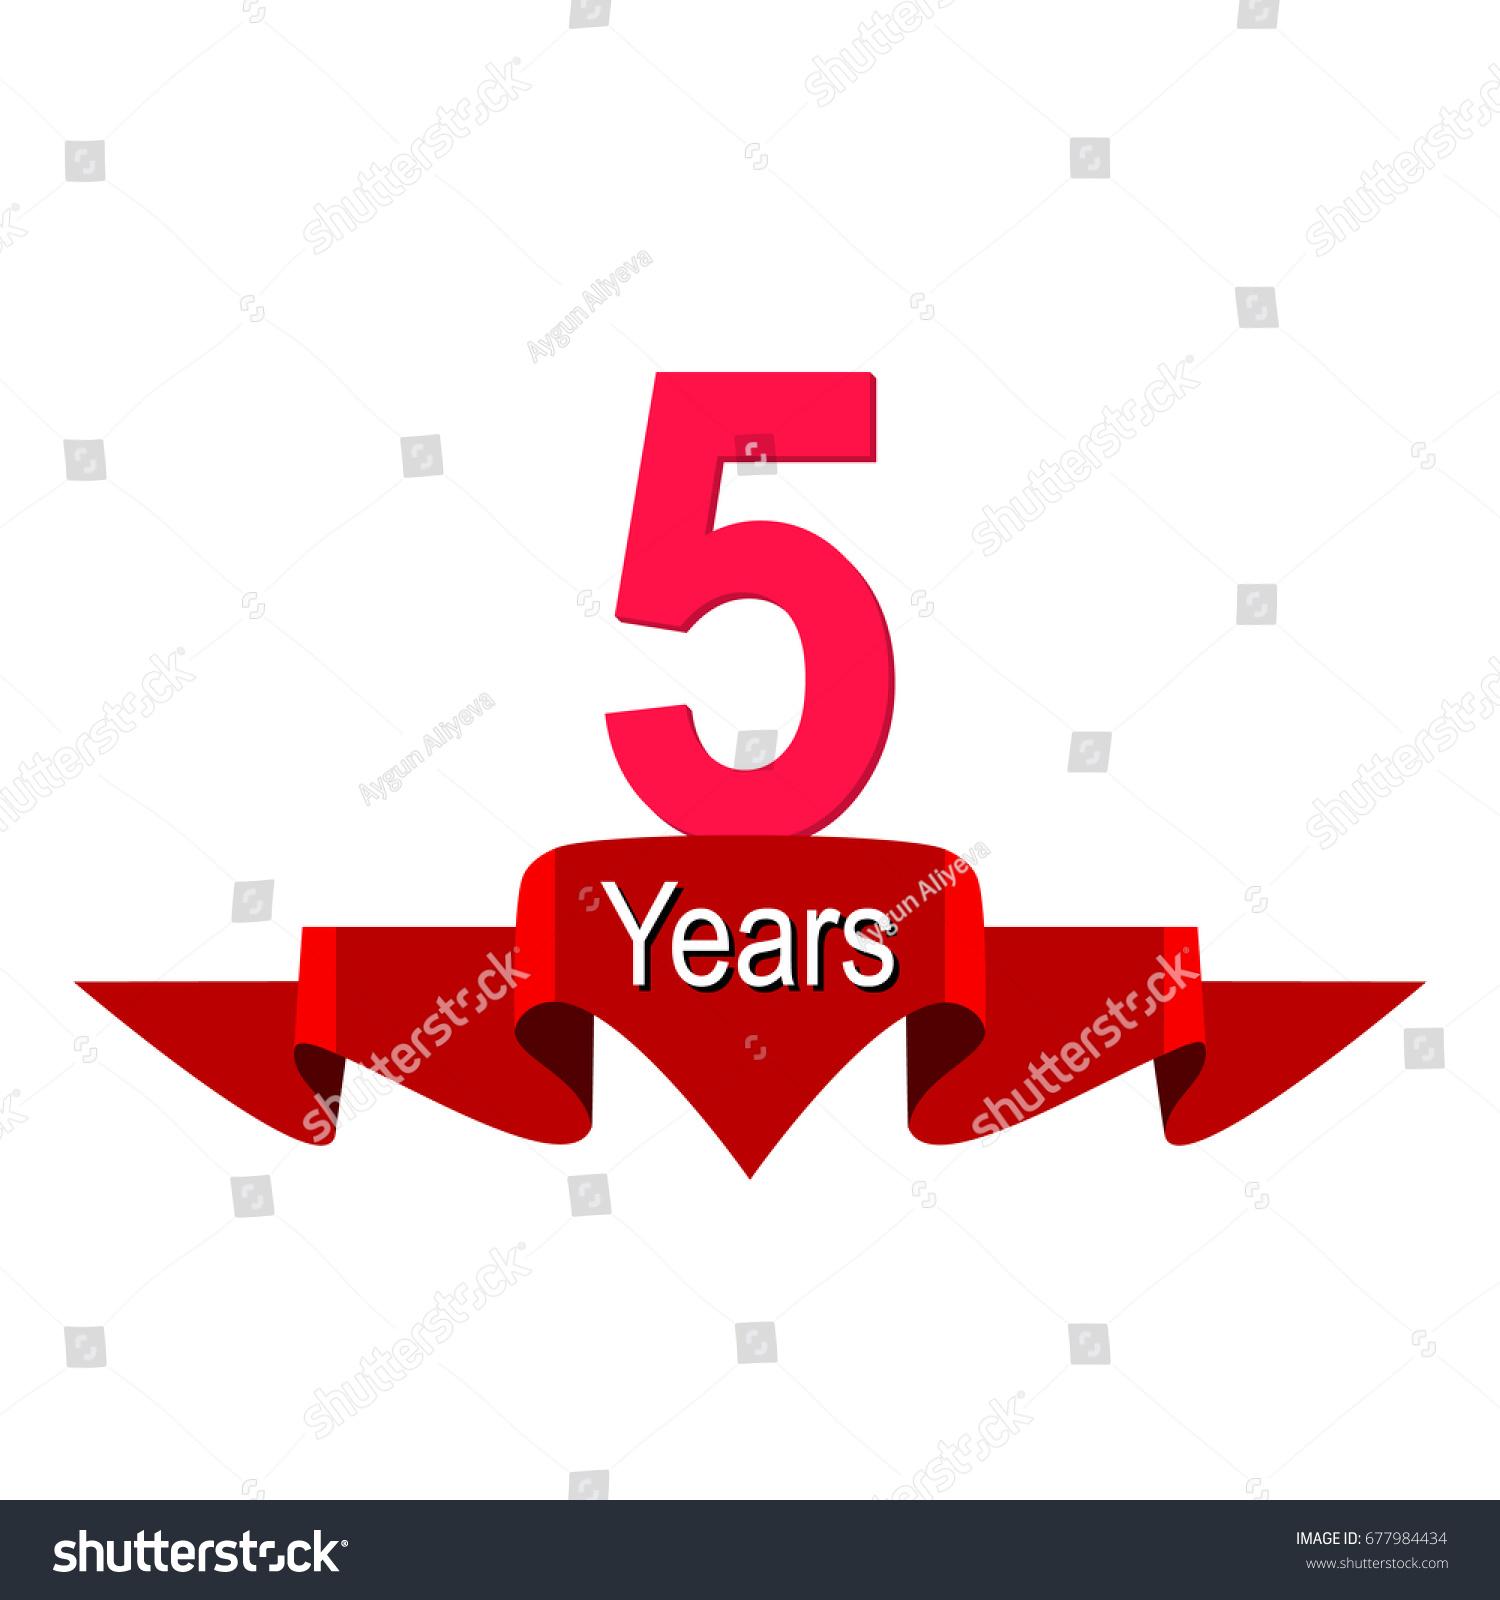 5 year anniversary logo red ribbon stock vector 677984434 5 year anniversary logo with red ribbon flat style vector illustration biocorpaavc Gallery